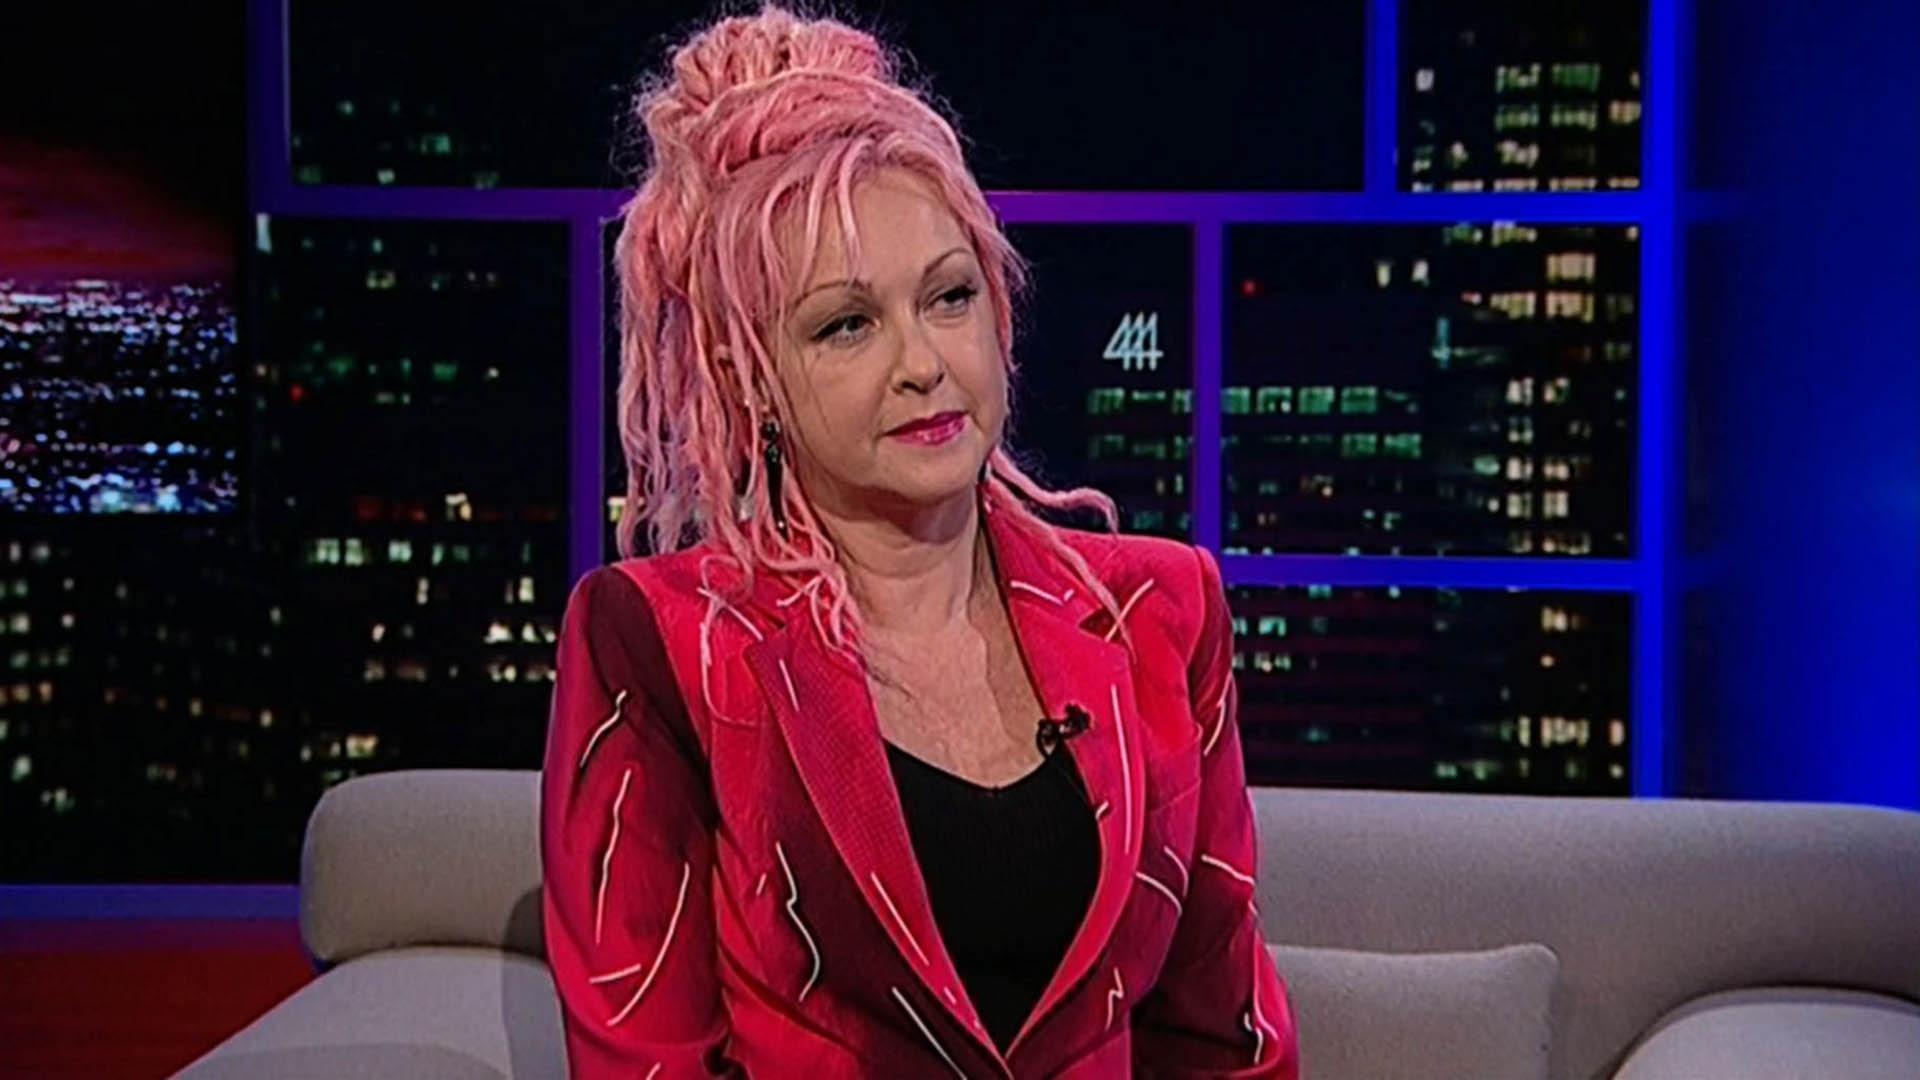 Singer-songwriter Cyndi Lauper, pt. 1